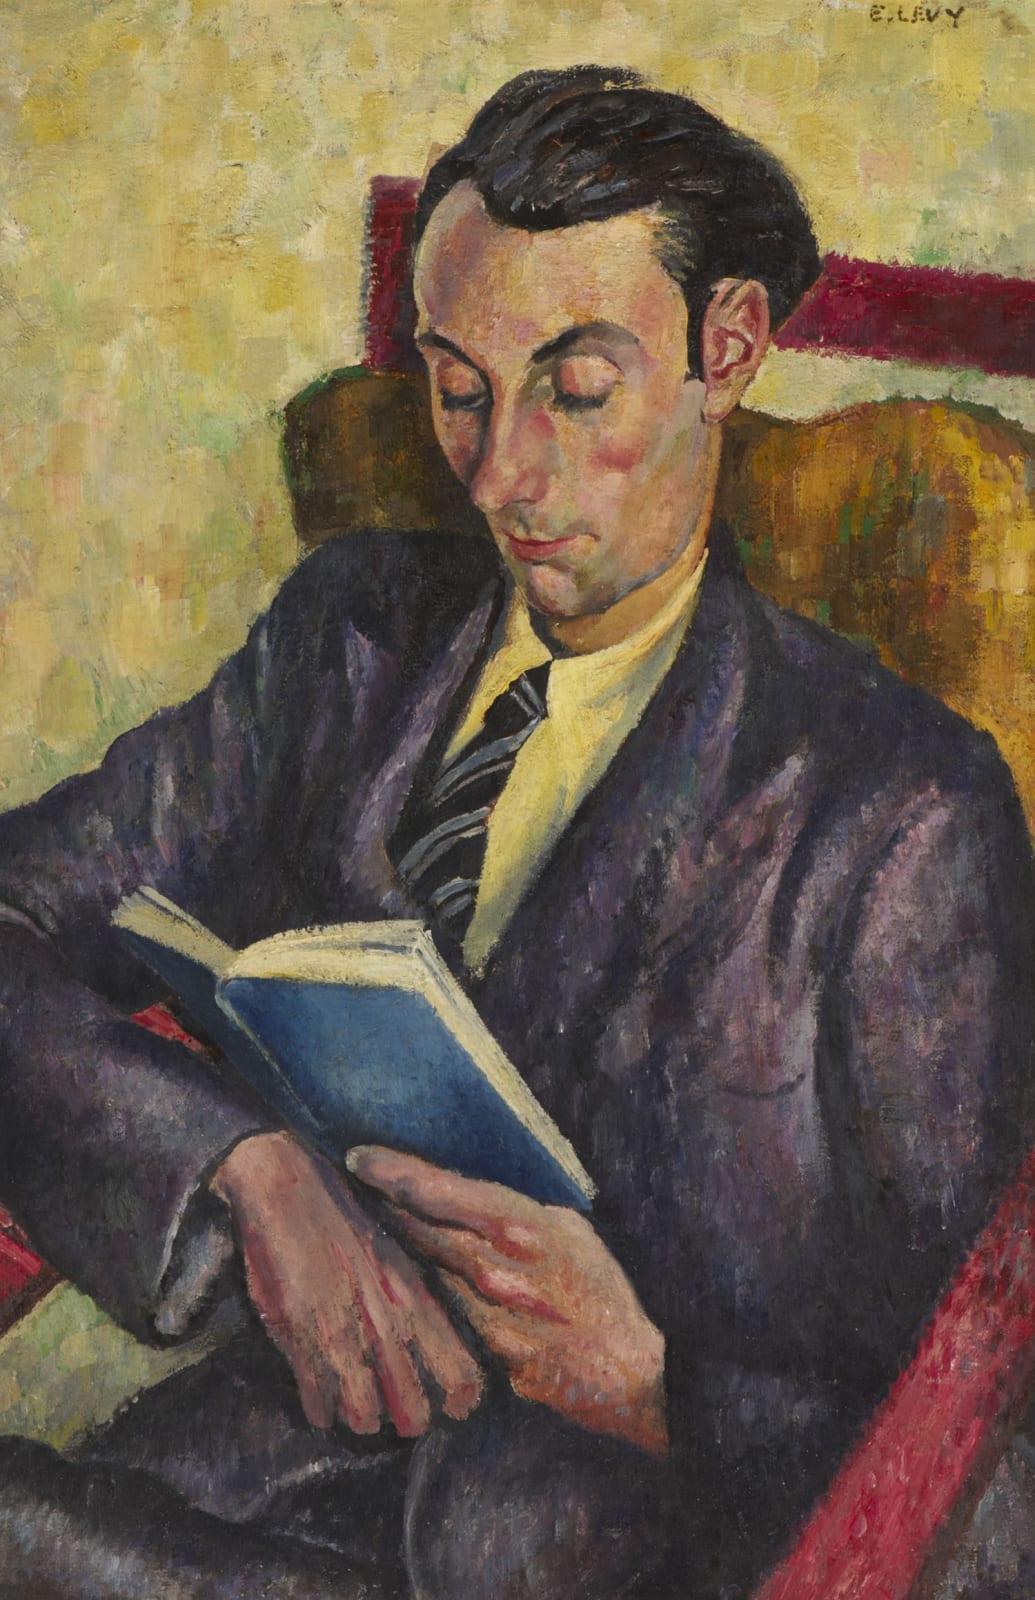 Emmanuel Levy (1900-1986) Man Reading 1930s Oil on canvas 74 x 48.5 cm Ben Uri Collection © Emmanuel Levy estate